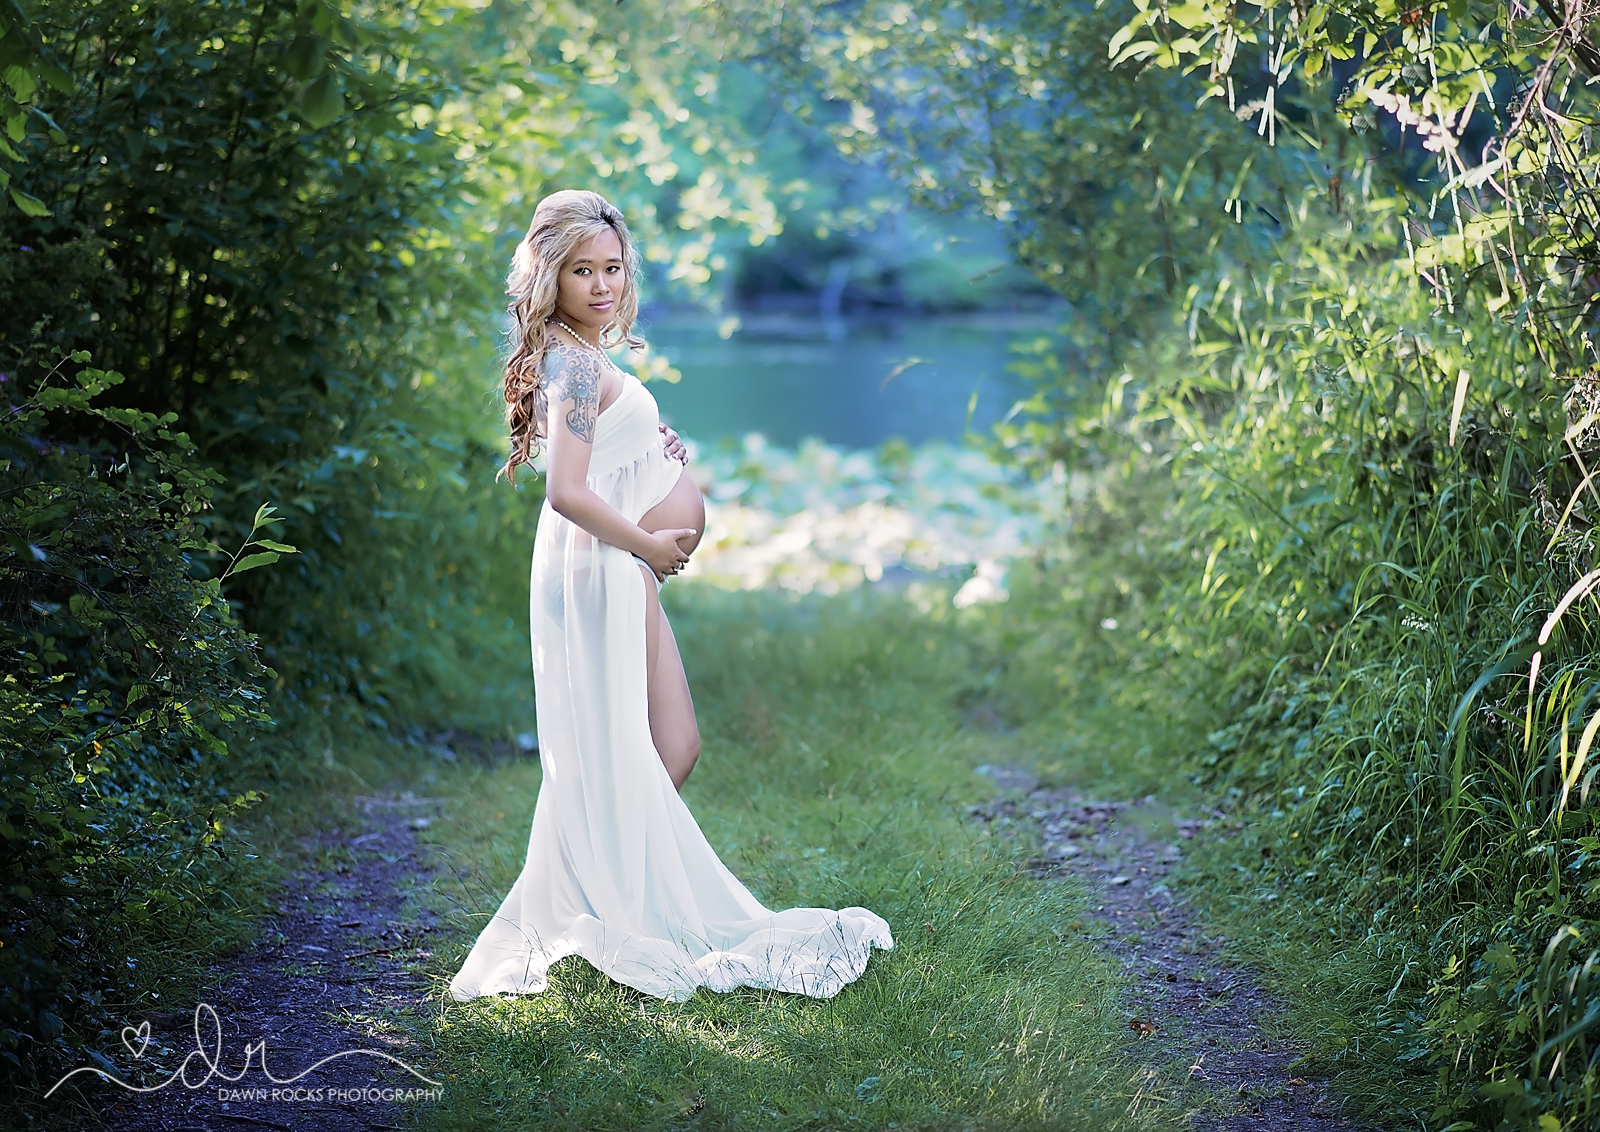 Tacoma Maternity Photographer 2.png